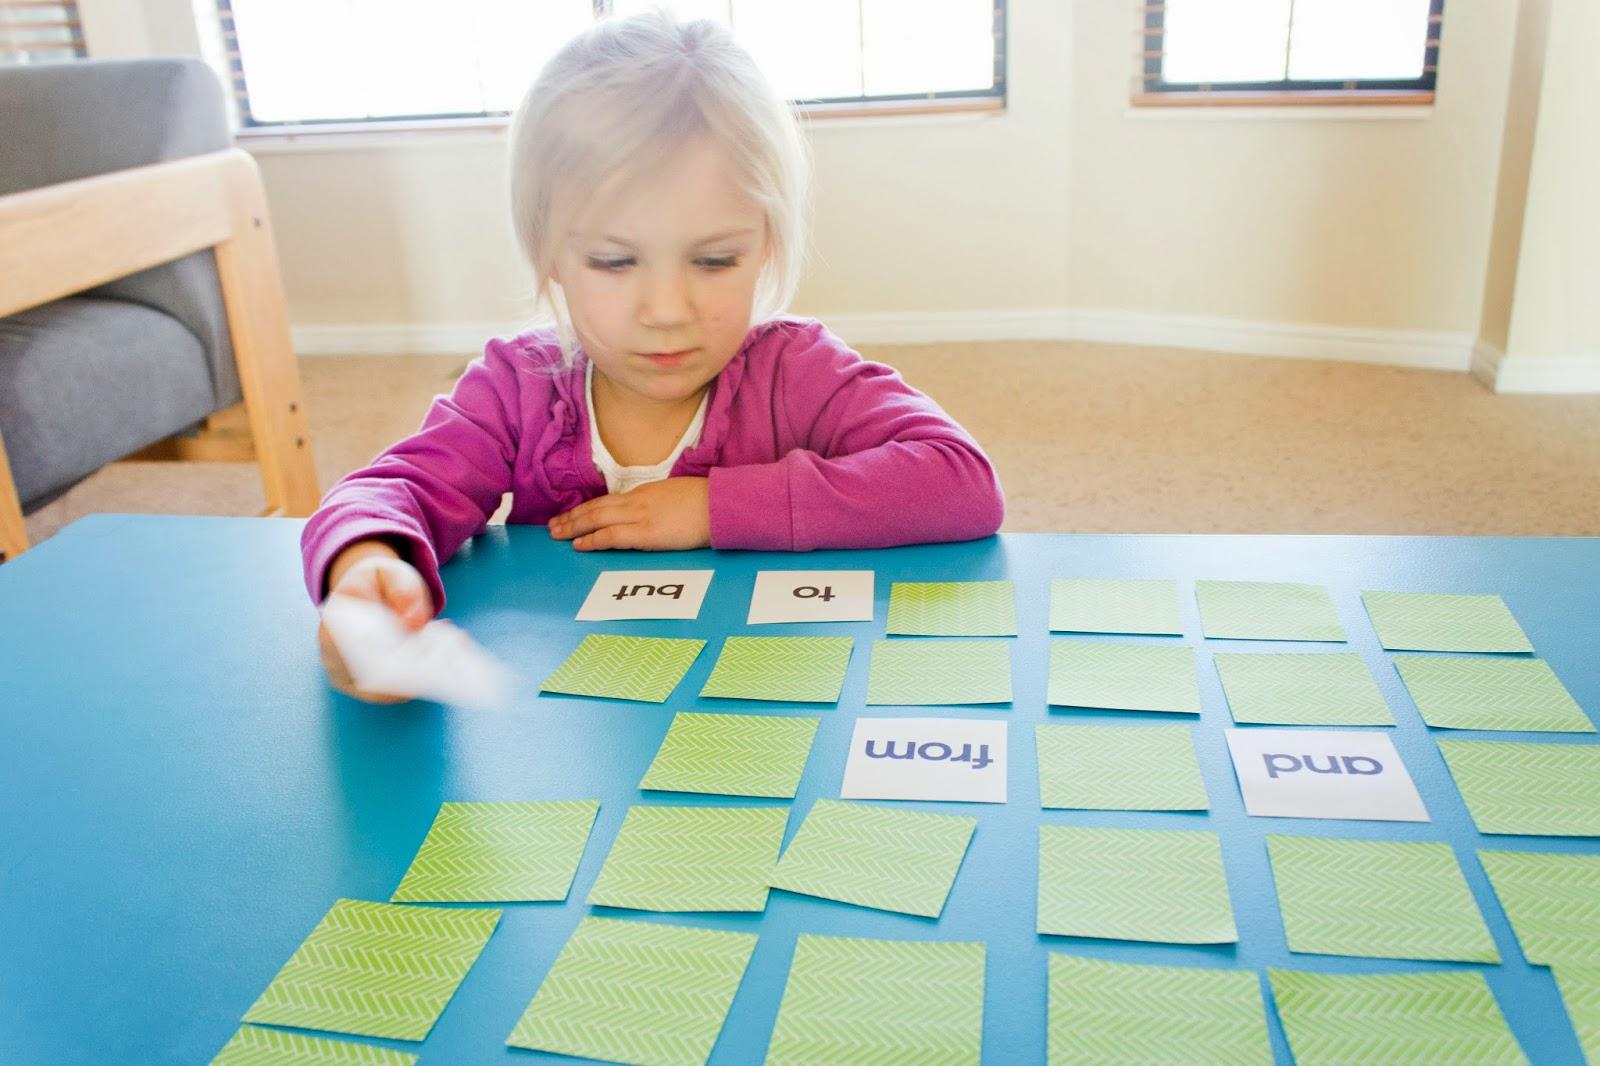 sight word worksheet: NEW 261 SIGHT WORD MEMORY GAME PRINTABLE |Sight Word Memory